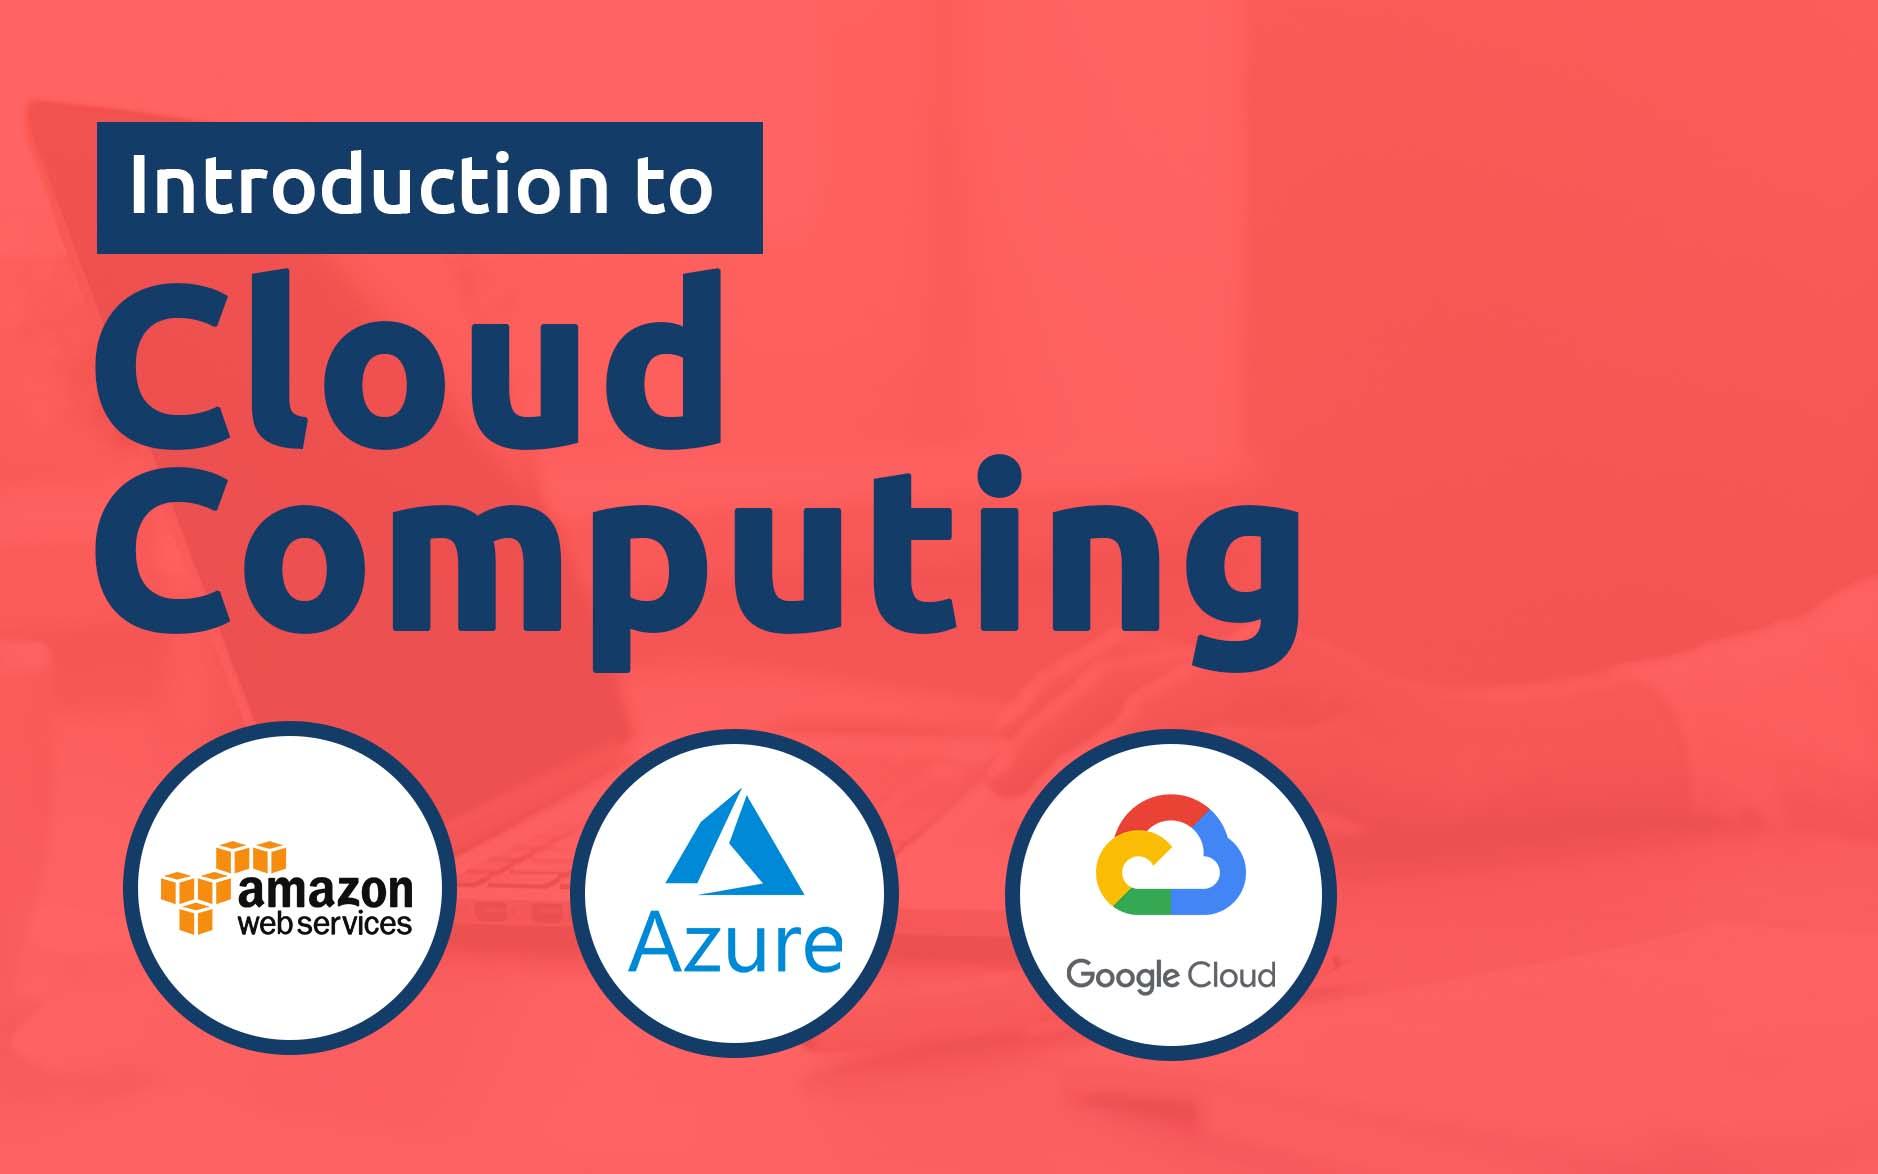 Understanding Cloud Computing| 8-15 yrs (Amazon Web Services + Microsoft Azure +Google Cloud)